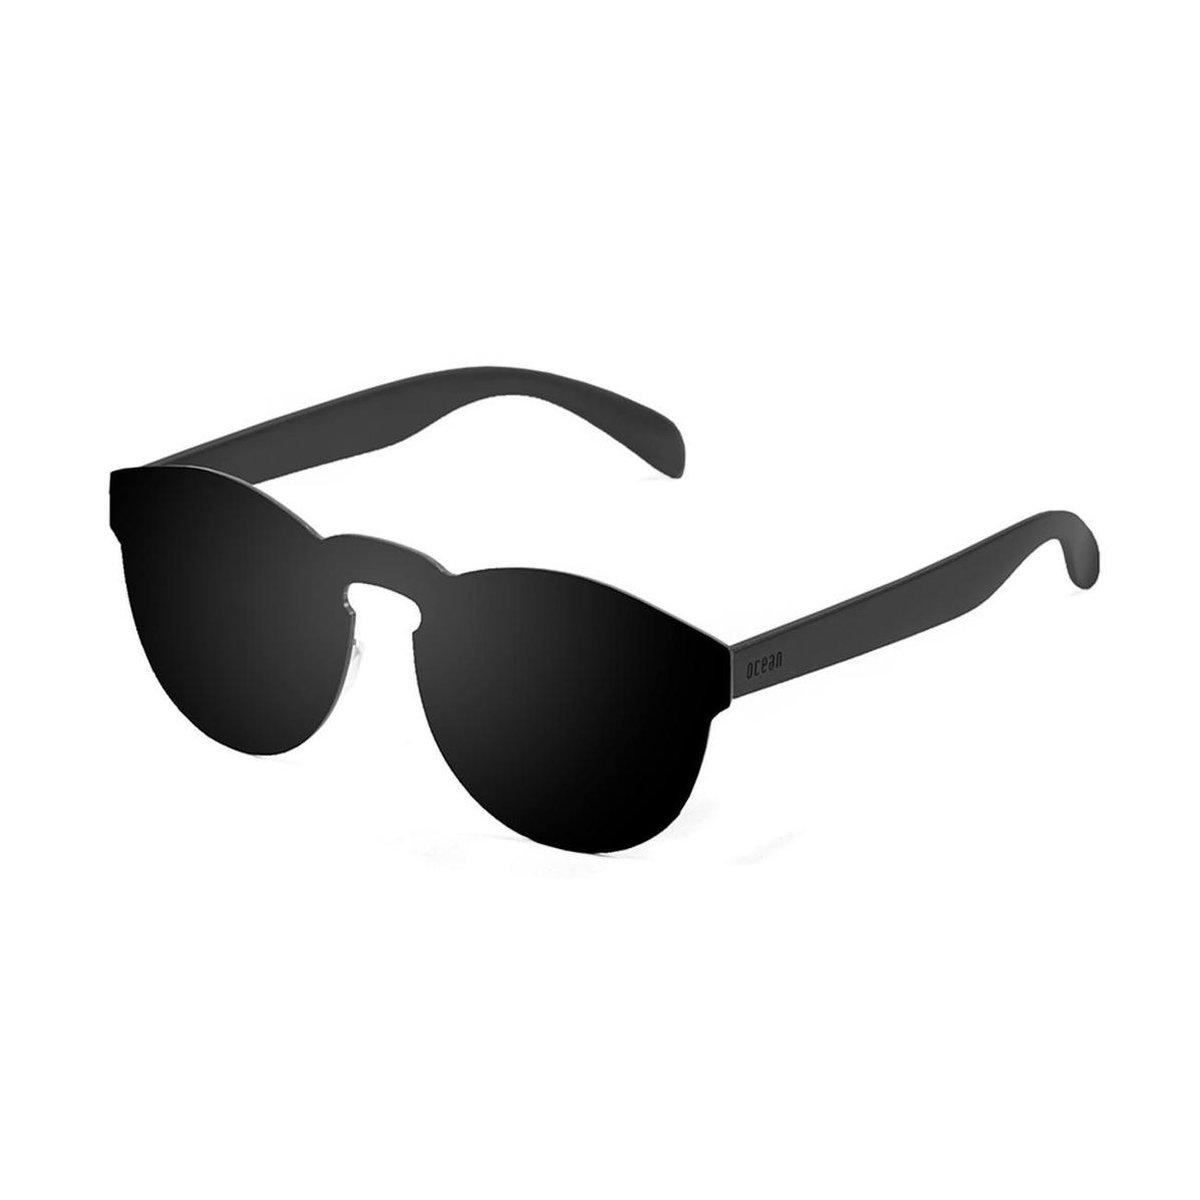 Ocean Sunglasses - IBIZA - Unisex Zonnebril zwart - Ocean Sunglasses